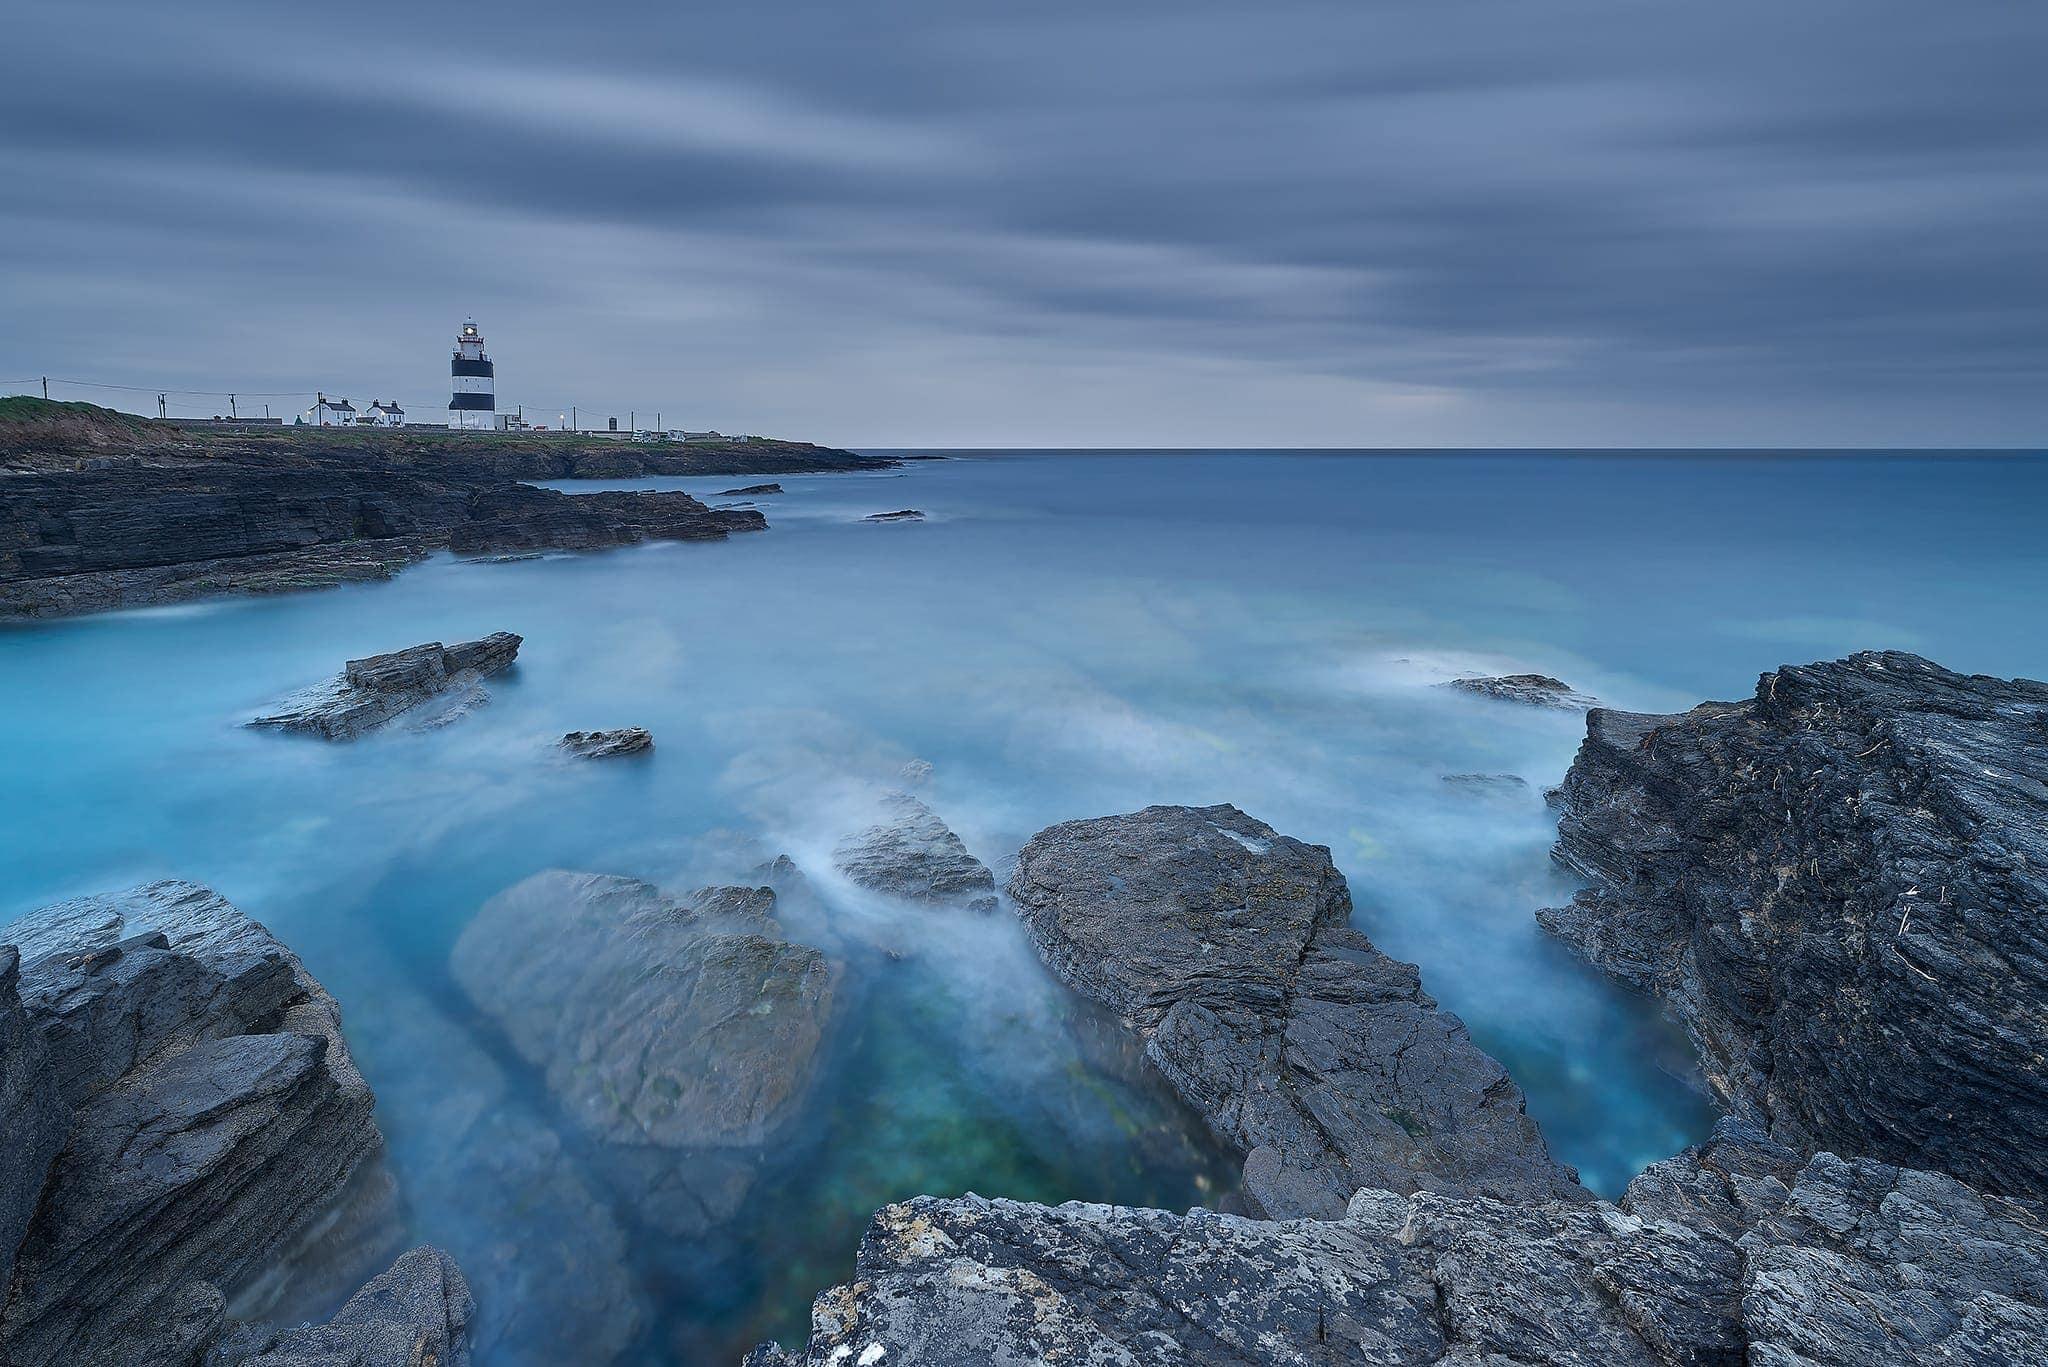 Francesco Gola Seascape Landscape Photography Ireland Lighthouse Long Exposure